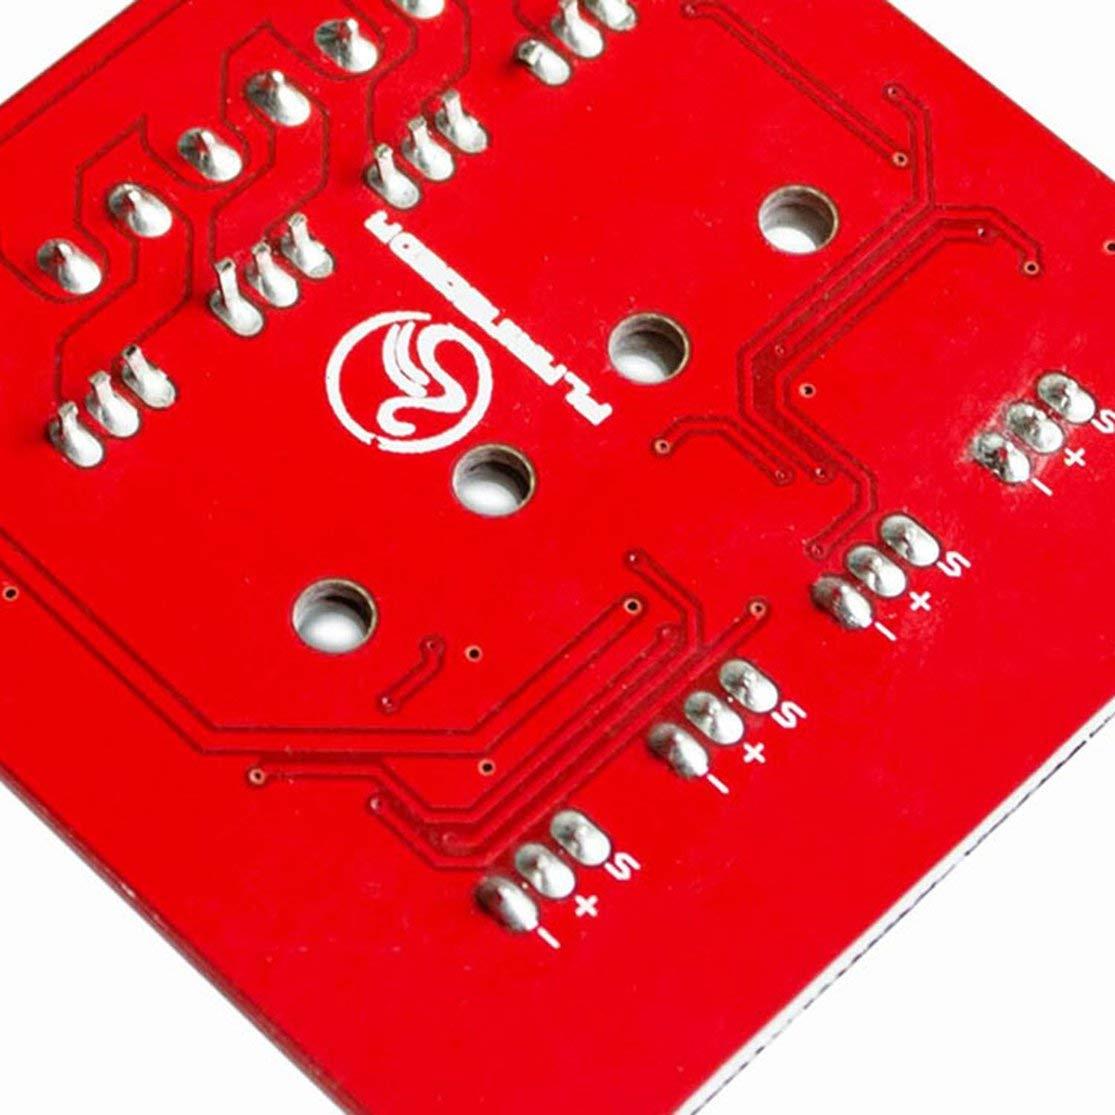 4-Kanal 4-Wege-MOSFET-Taster IRF540 V2.0 Farbe: Multicolor MOSFET-Schaltmodul Arduino